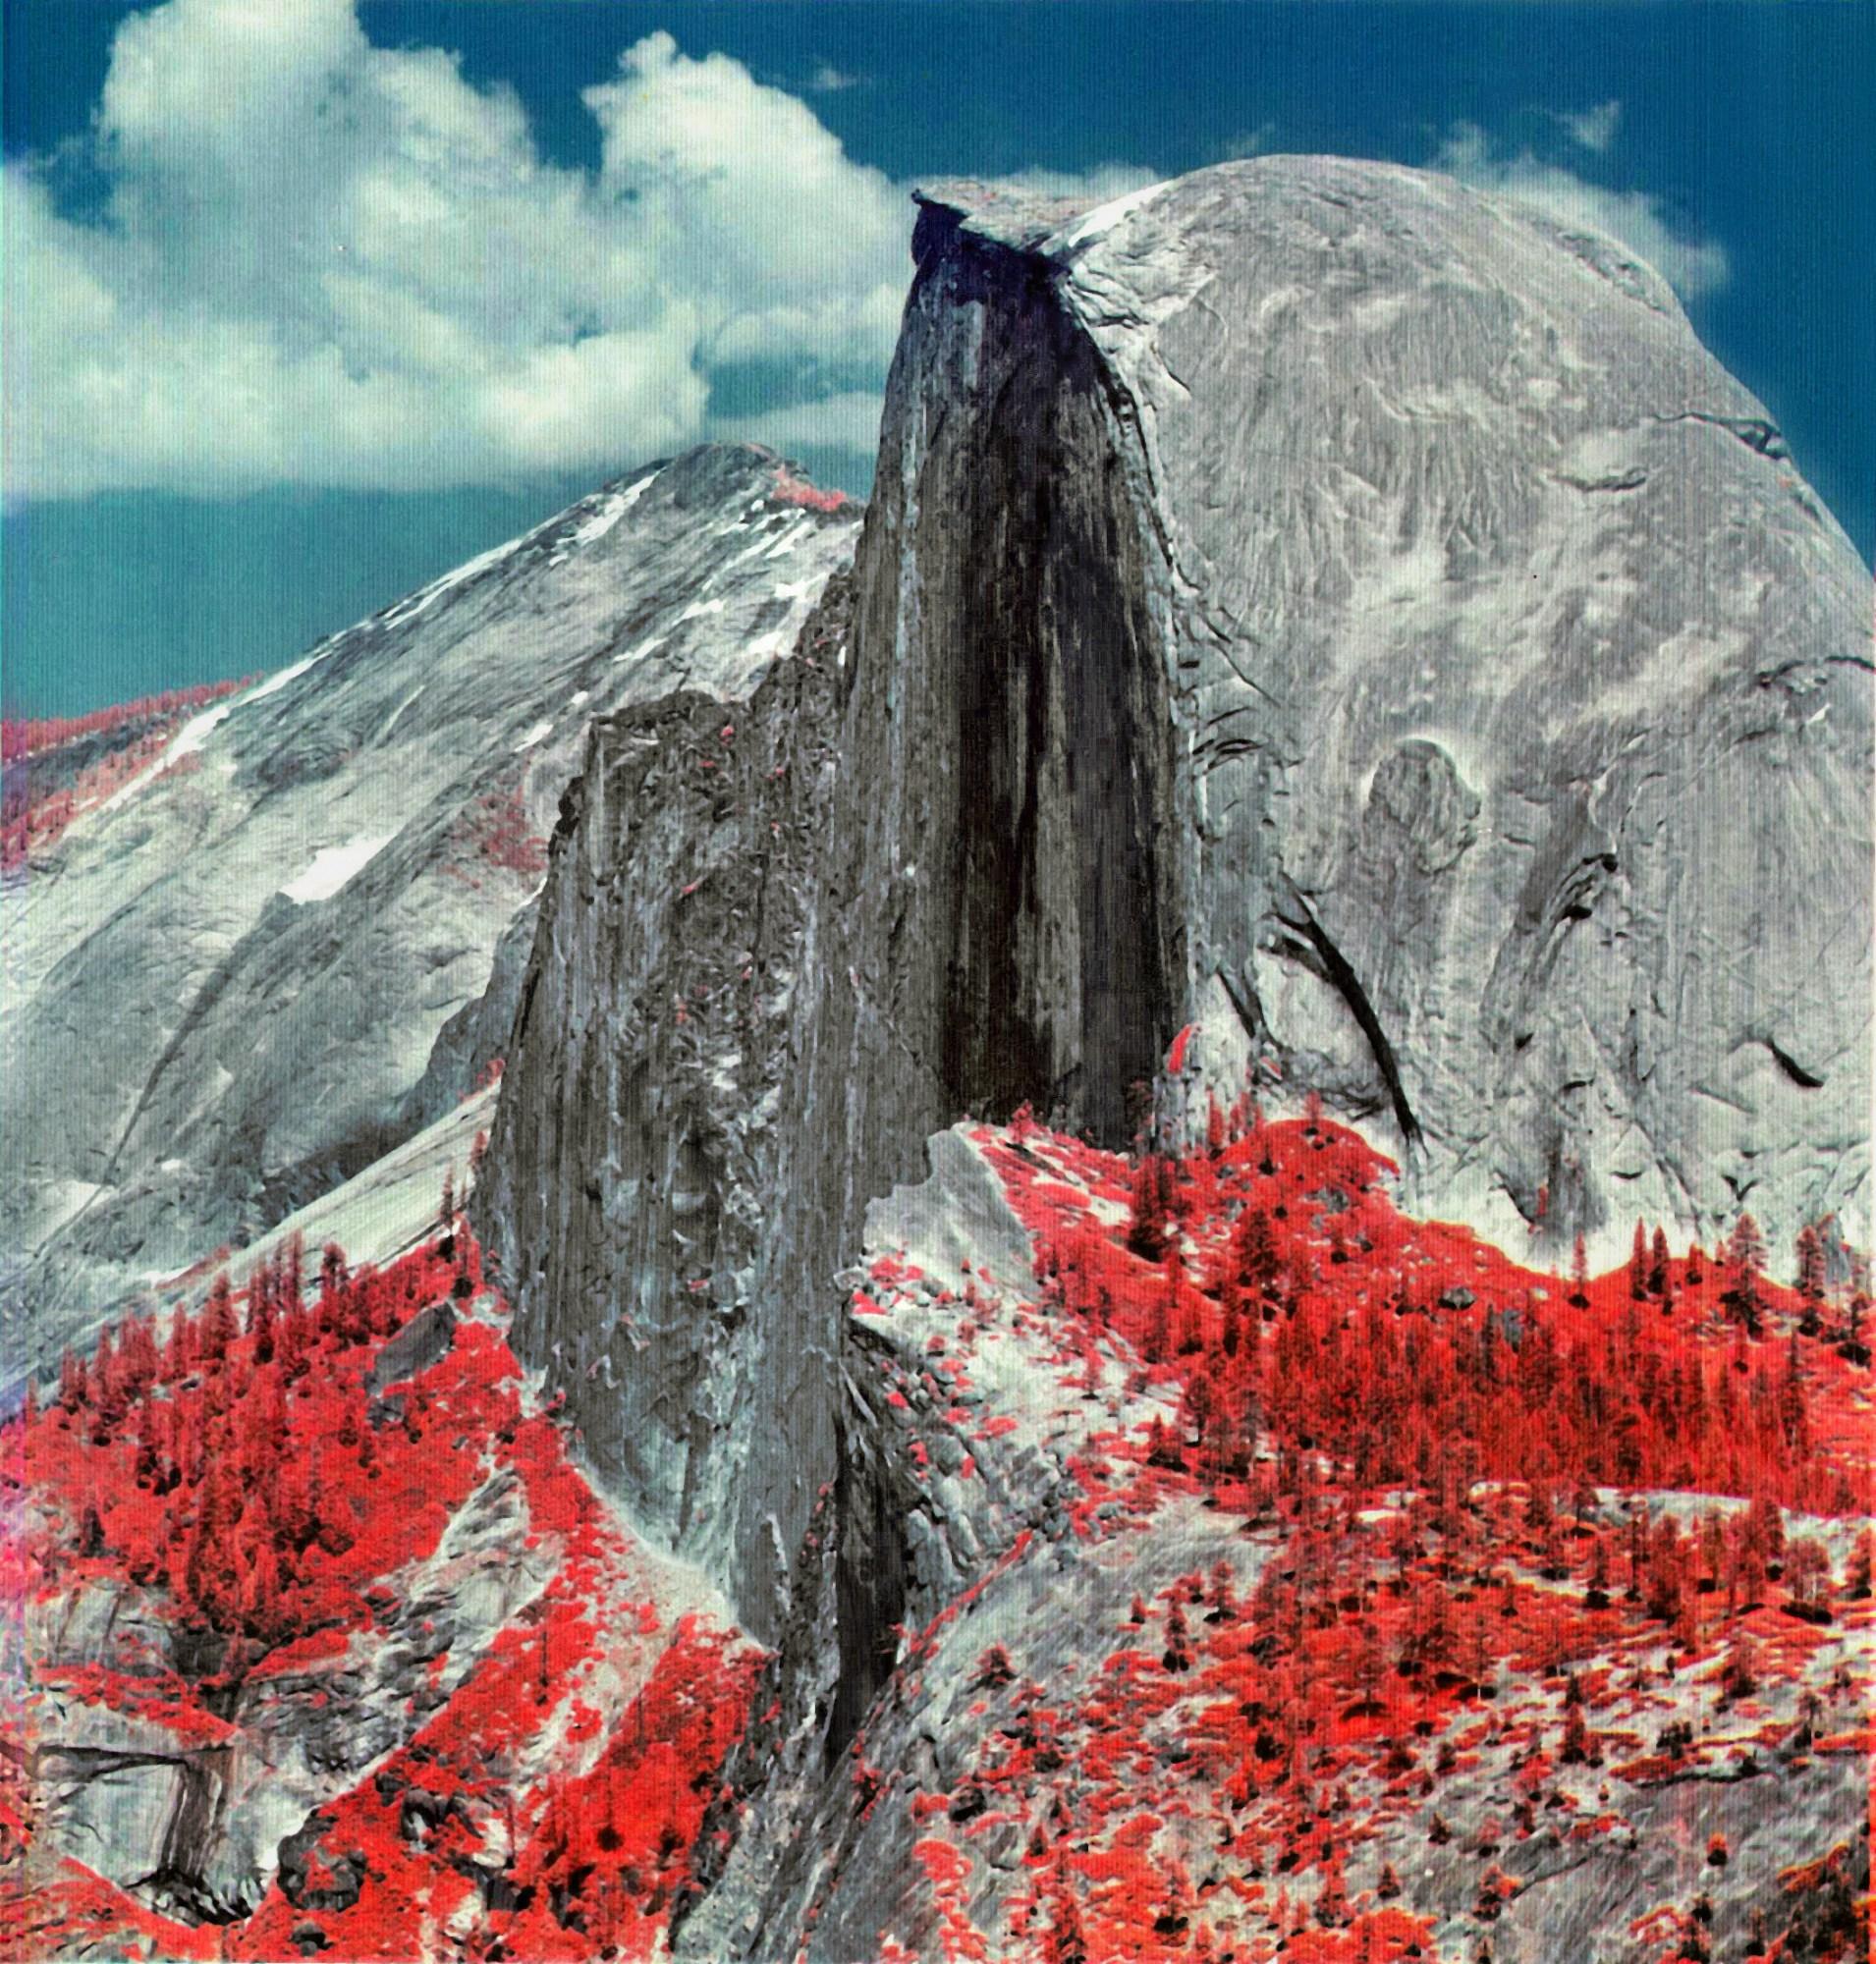 MSS image of Half Dome